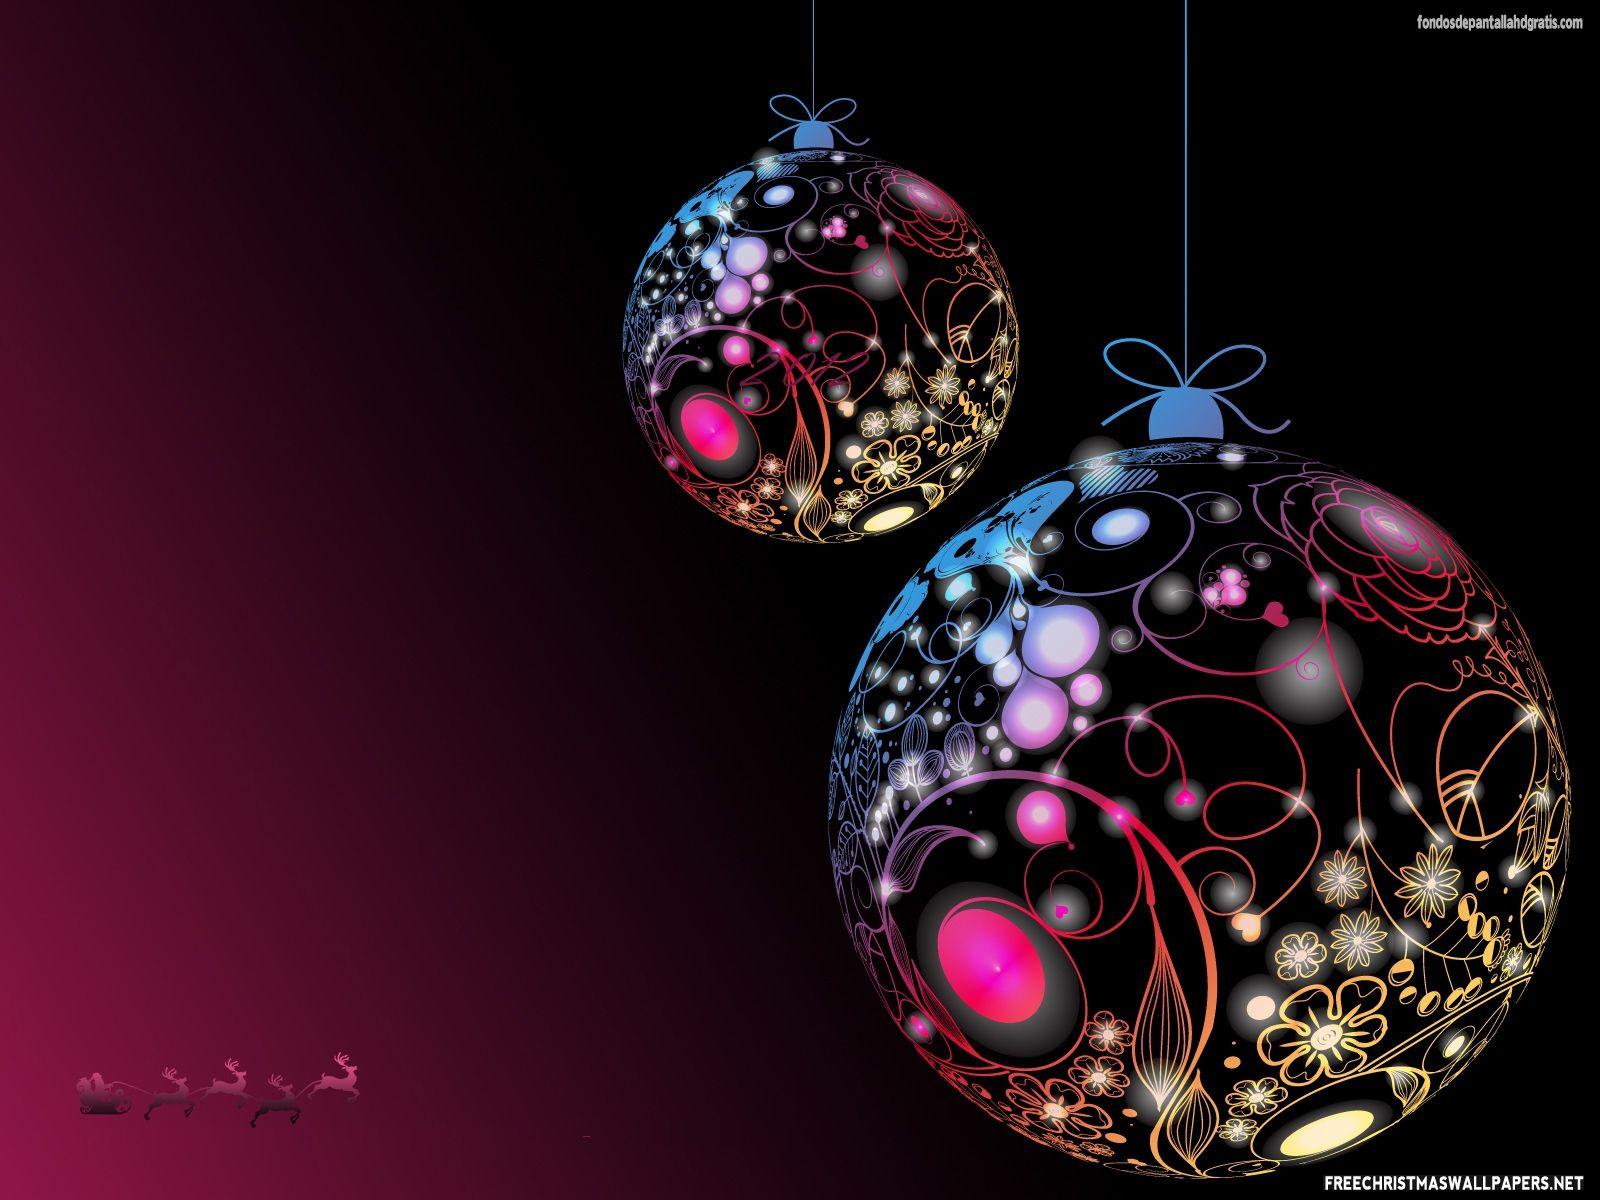 Fondos De Pantalla Navidenos Gratis: Fondos De Navidad 1920X1080 Para Bajar Al Celular 10 HD